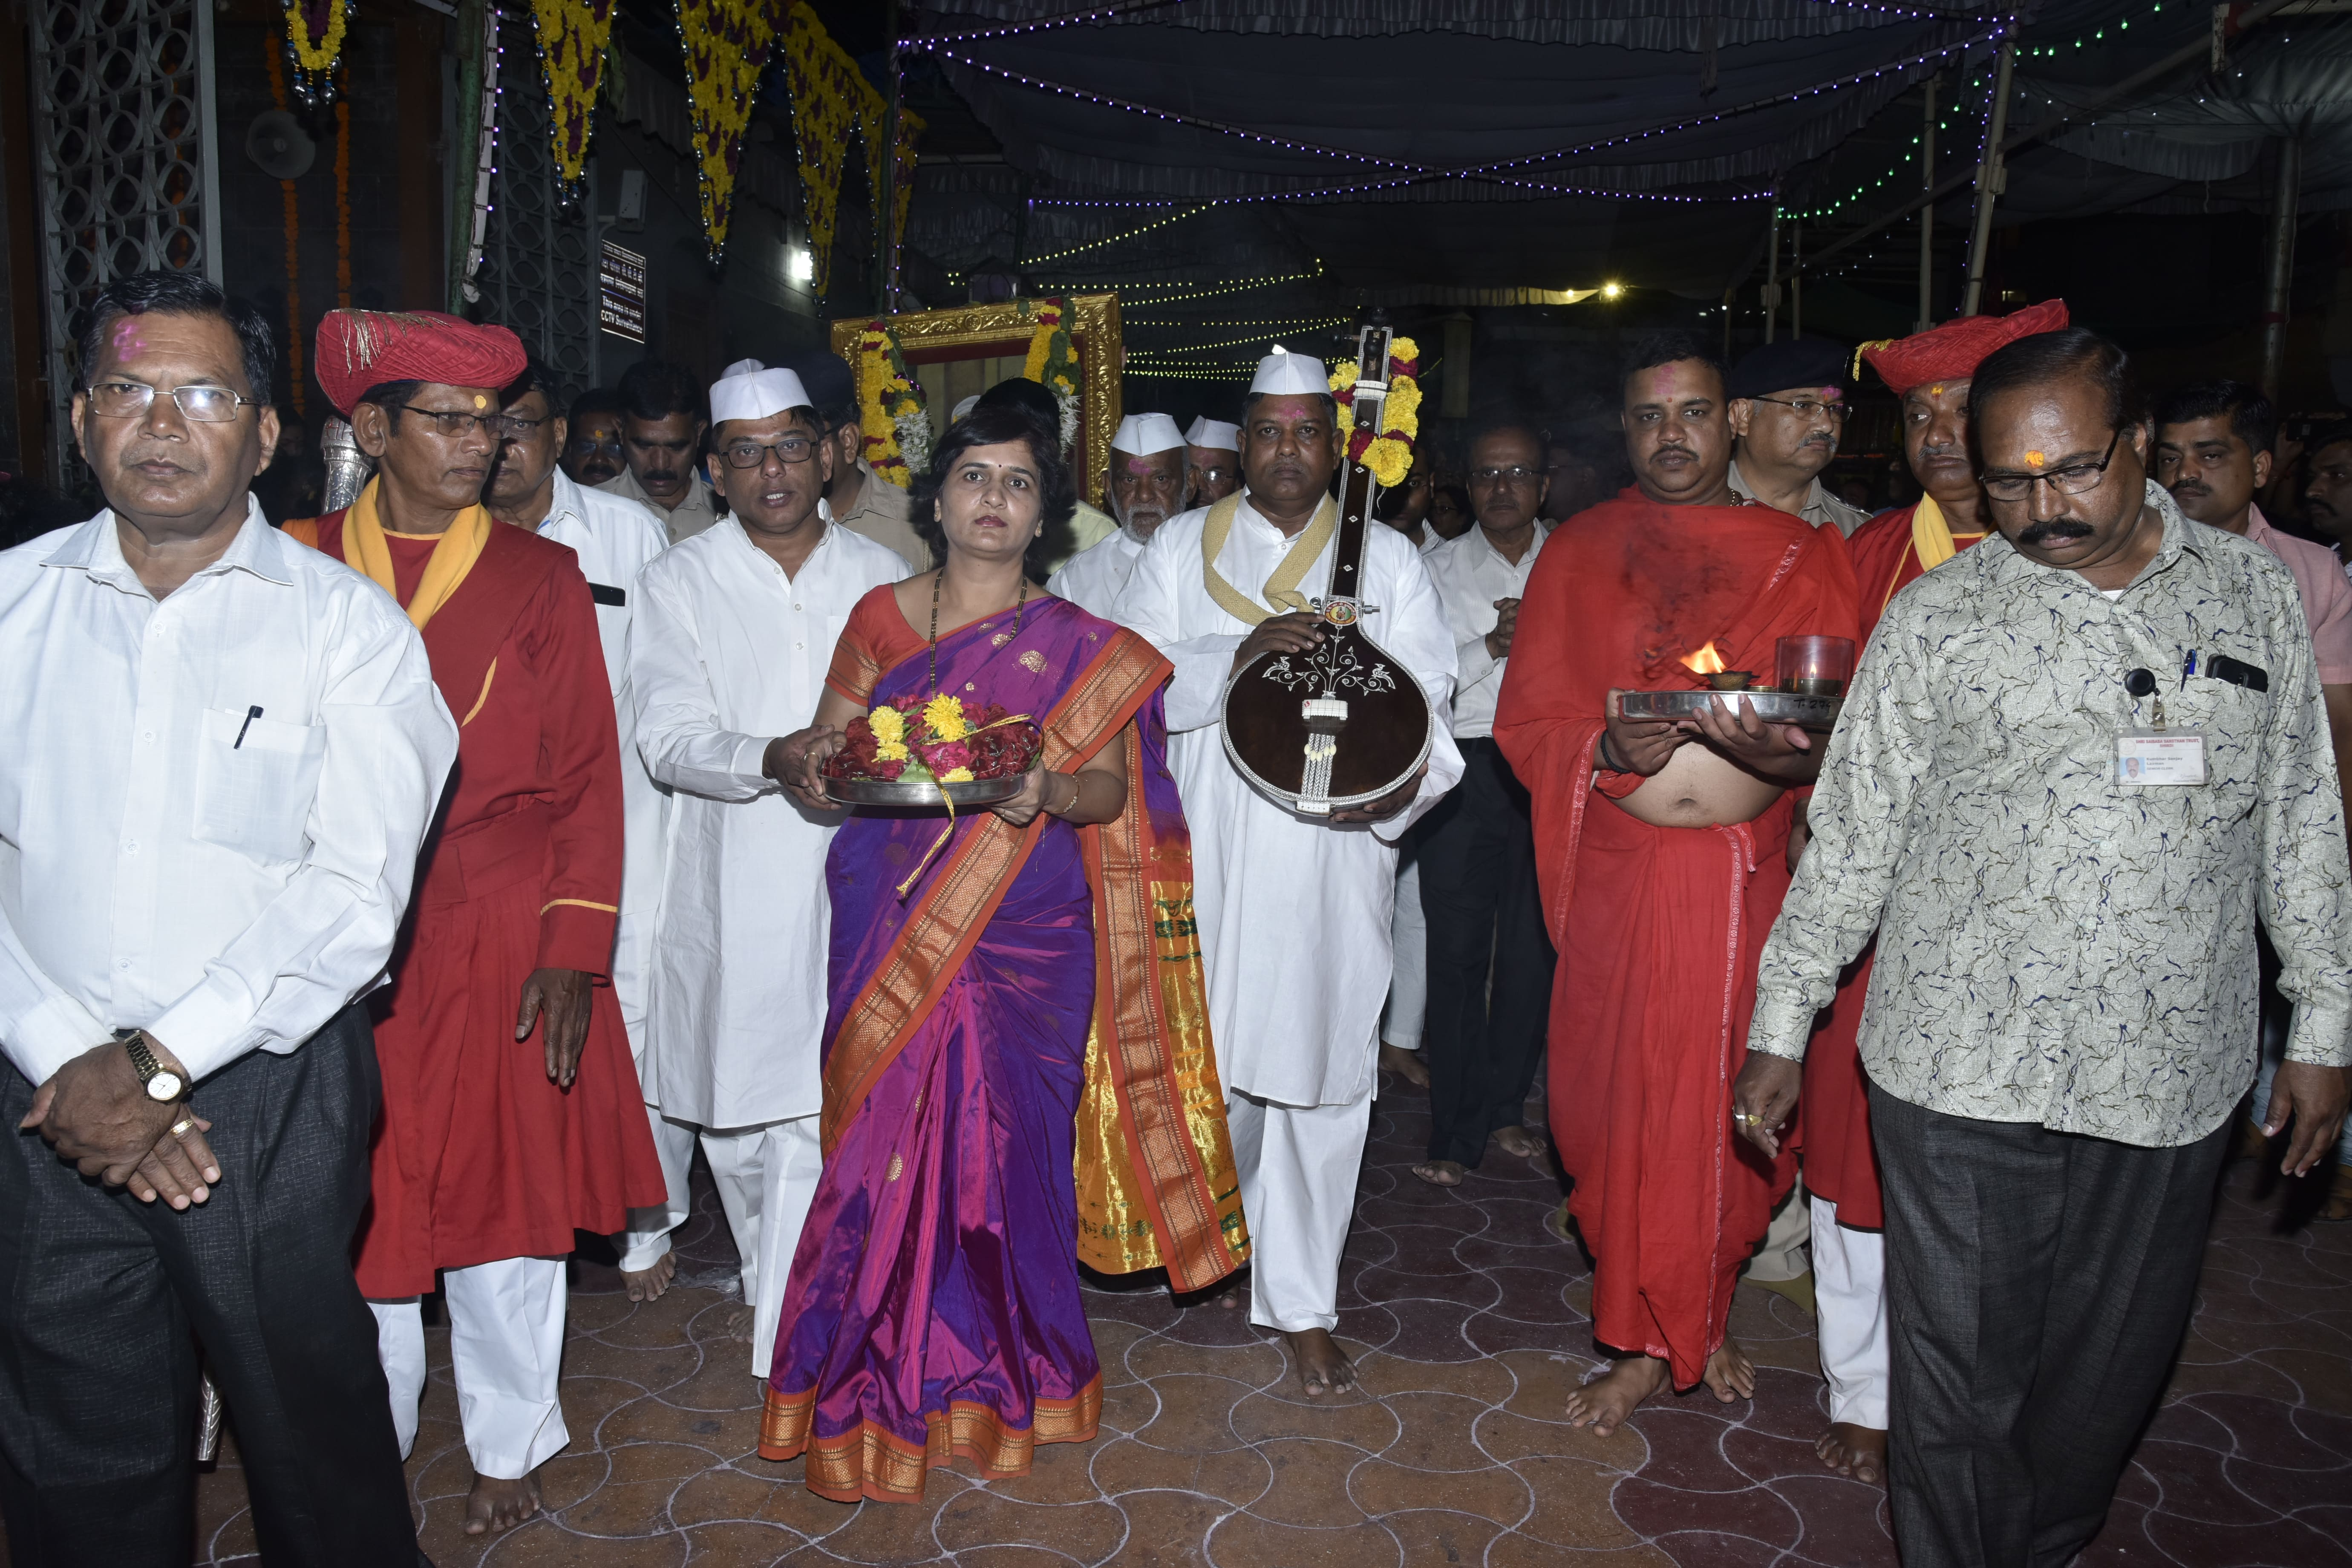 Sai Baba Photo Gallery - Shri Saibaba Sansthan Trust, Shirdi